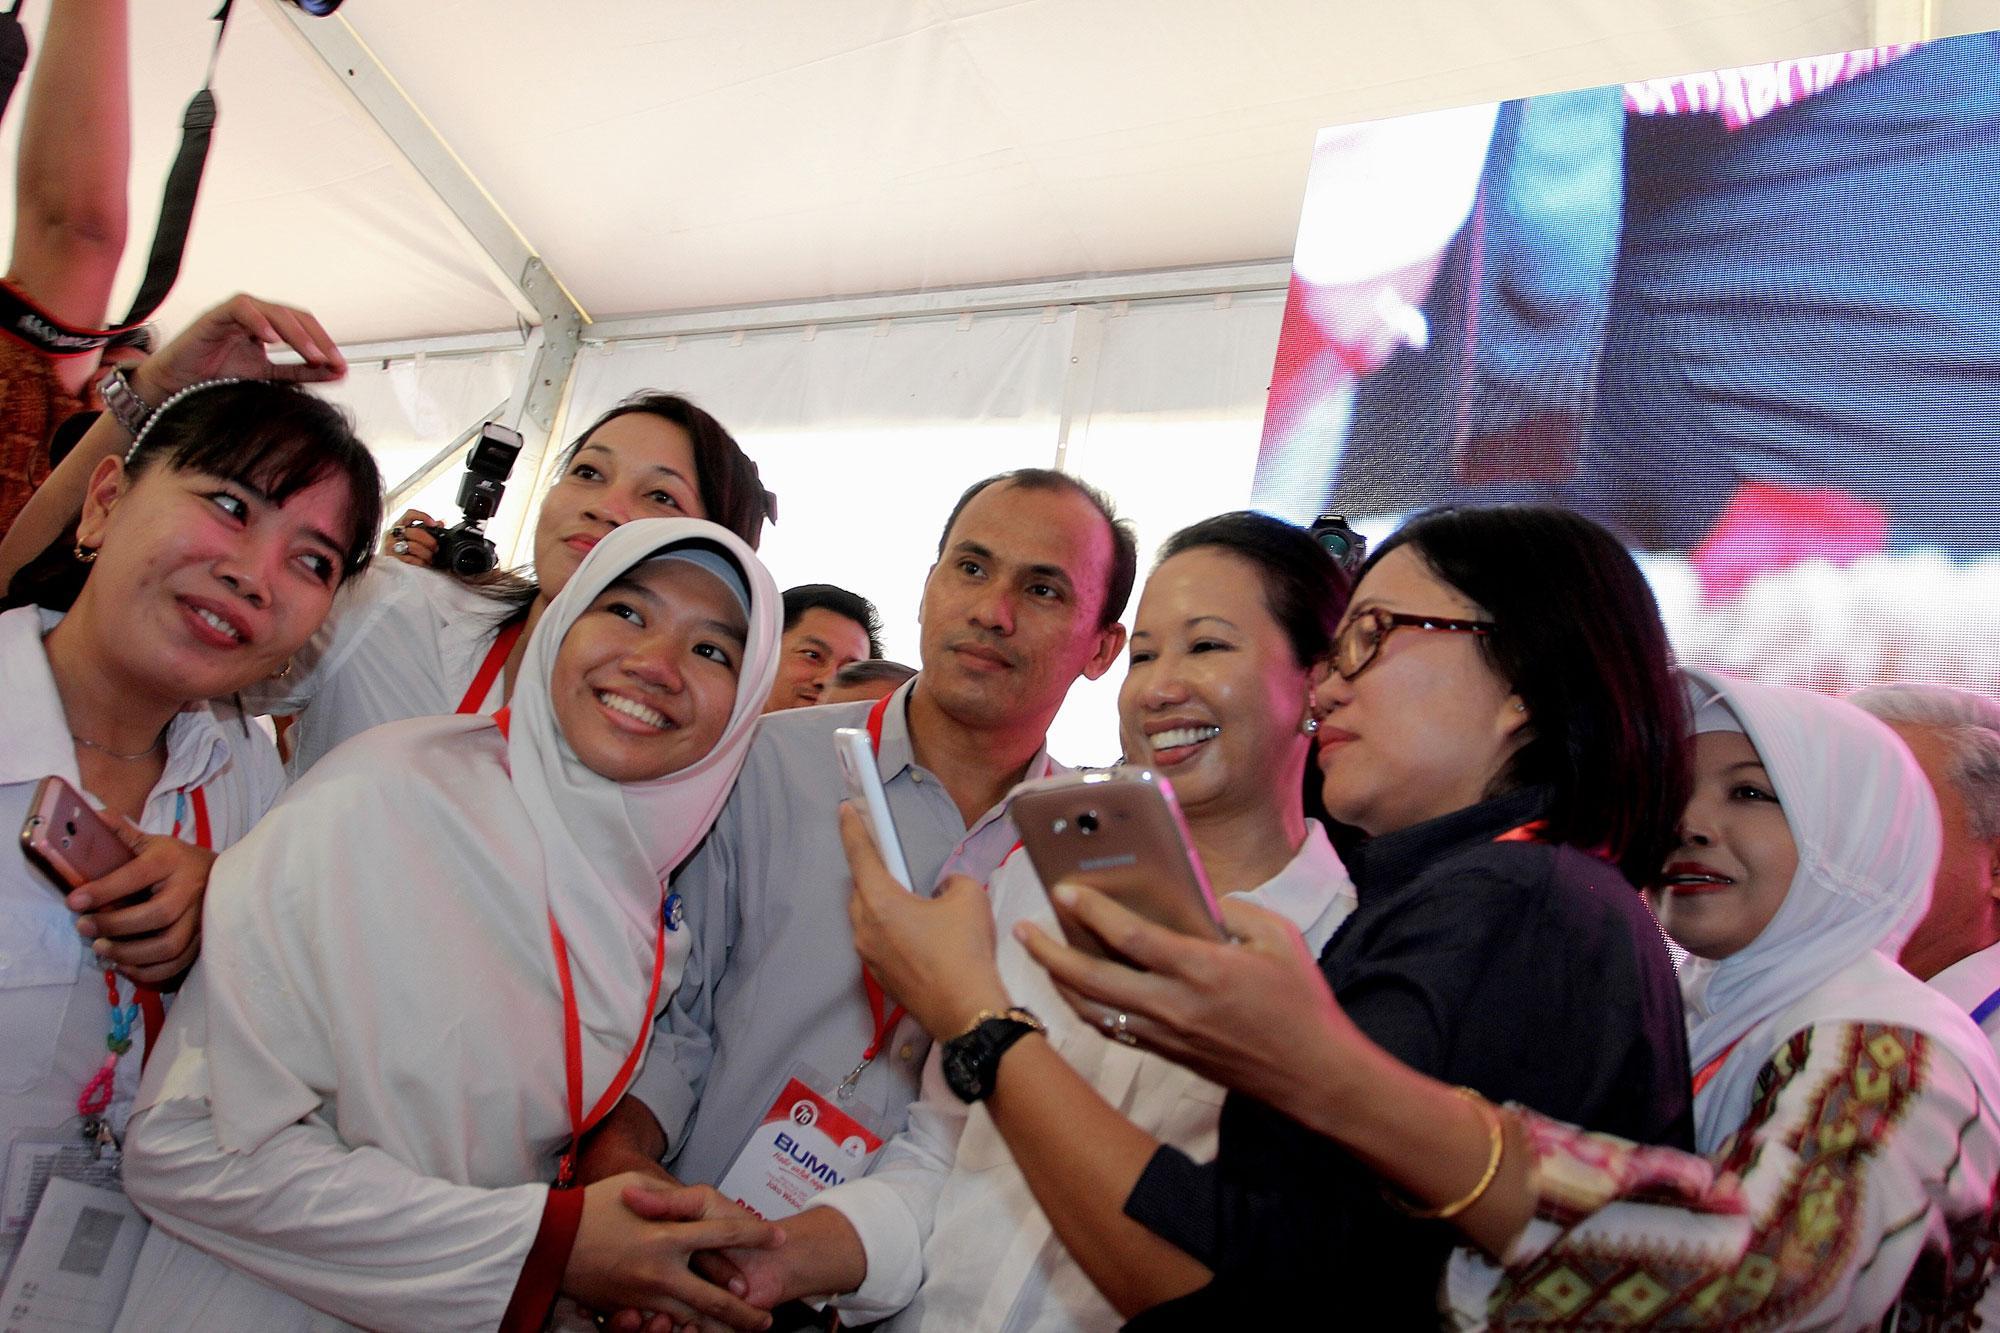 Menteri BUMN, Rini Soemarno, menyalami karyawan tingkat dasar Kementerian BUMN Republik Indonesia beserta seluruh Badan Usaha Milik Negara (BUMN) di Indonesia, saat menggelar rangkaian acara \